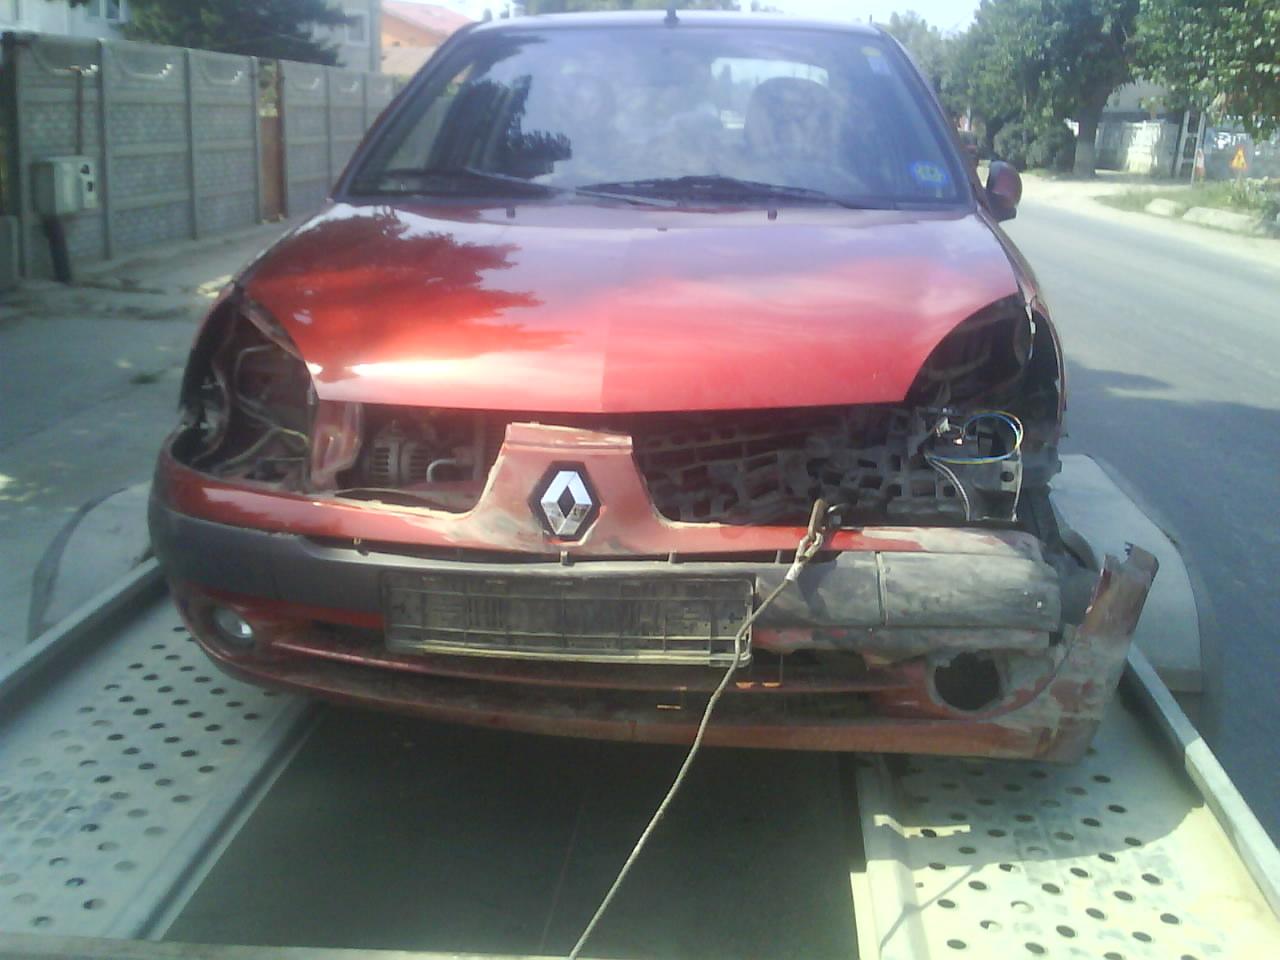 Renault Clio-II avariat 2006 Benzina Berlina - 11 Iunie 2011 - Poza 1